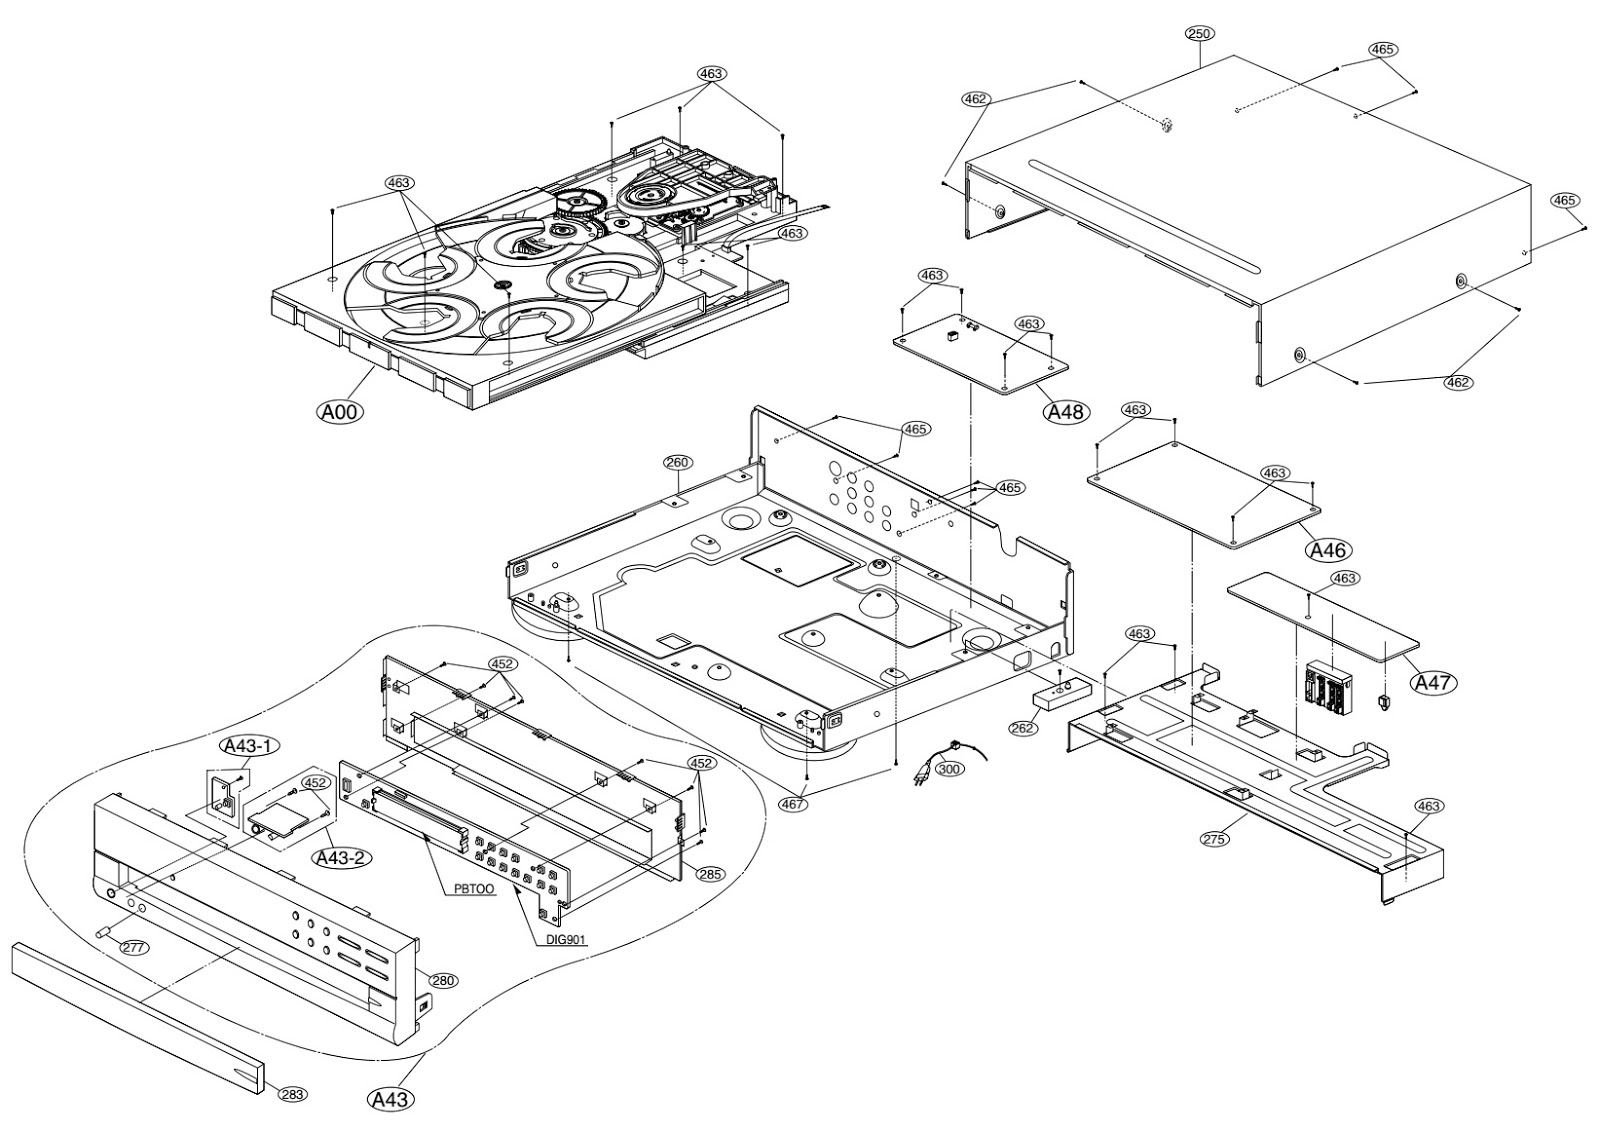 Schematic Diagrams 03 12 16